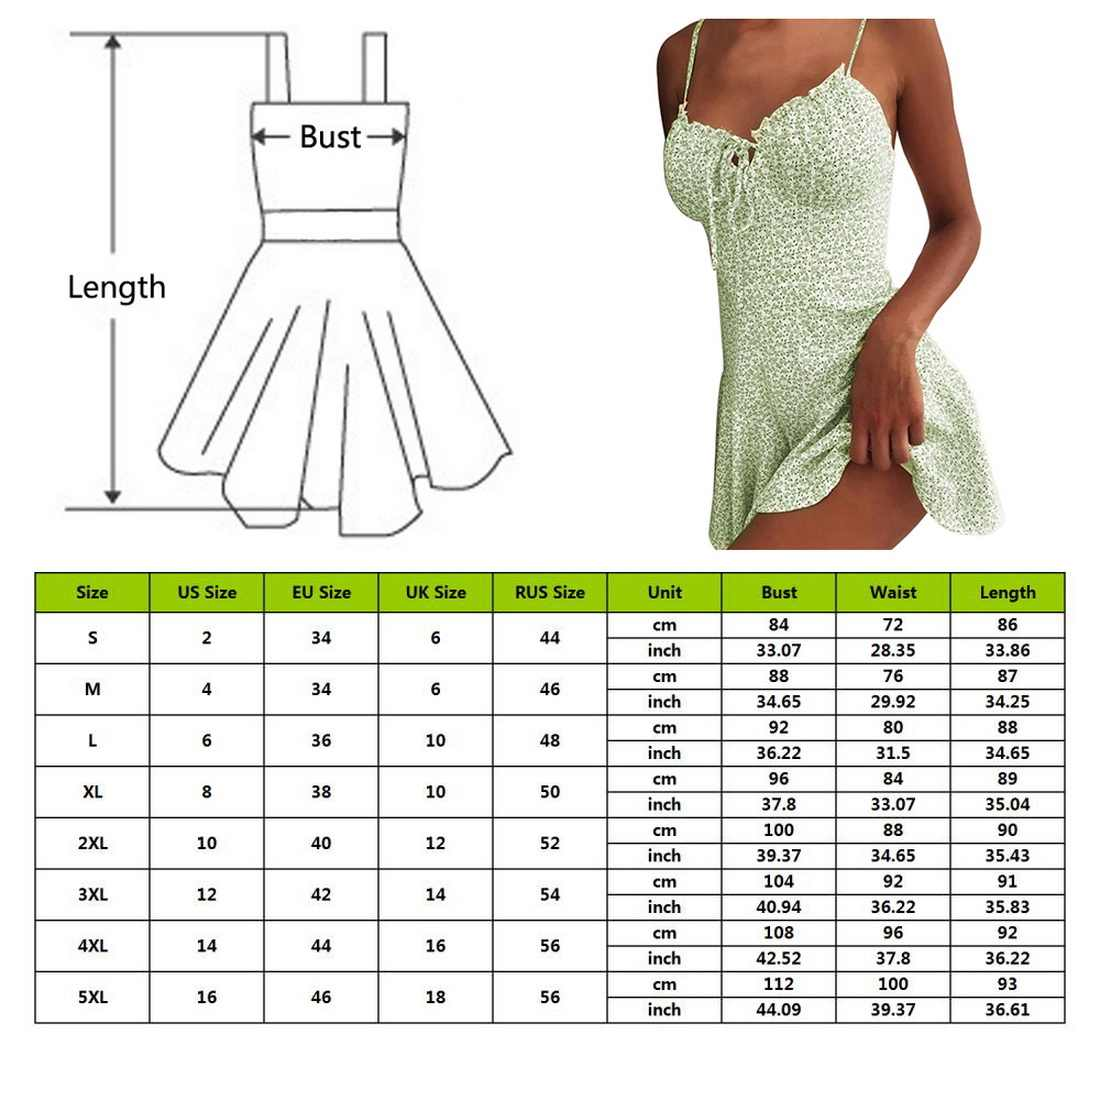 SHUJIN Frauen 2020 Sommer Print Mini Kleid Krawatte Vordere V Neck Partei Kleid Ärmel Spaghetti Strap Floral Vestidos